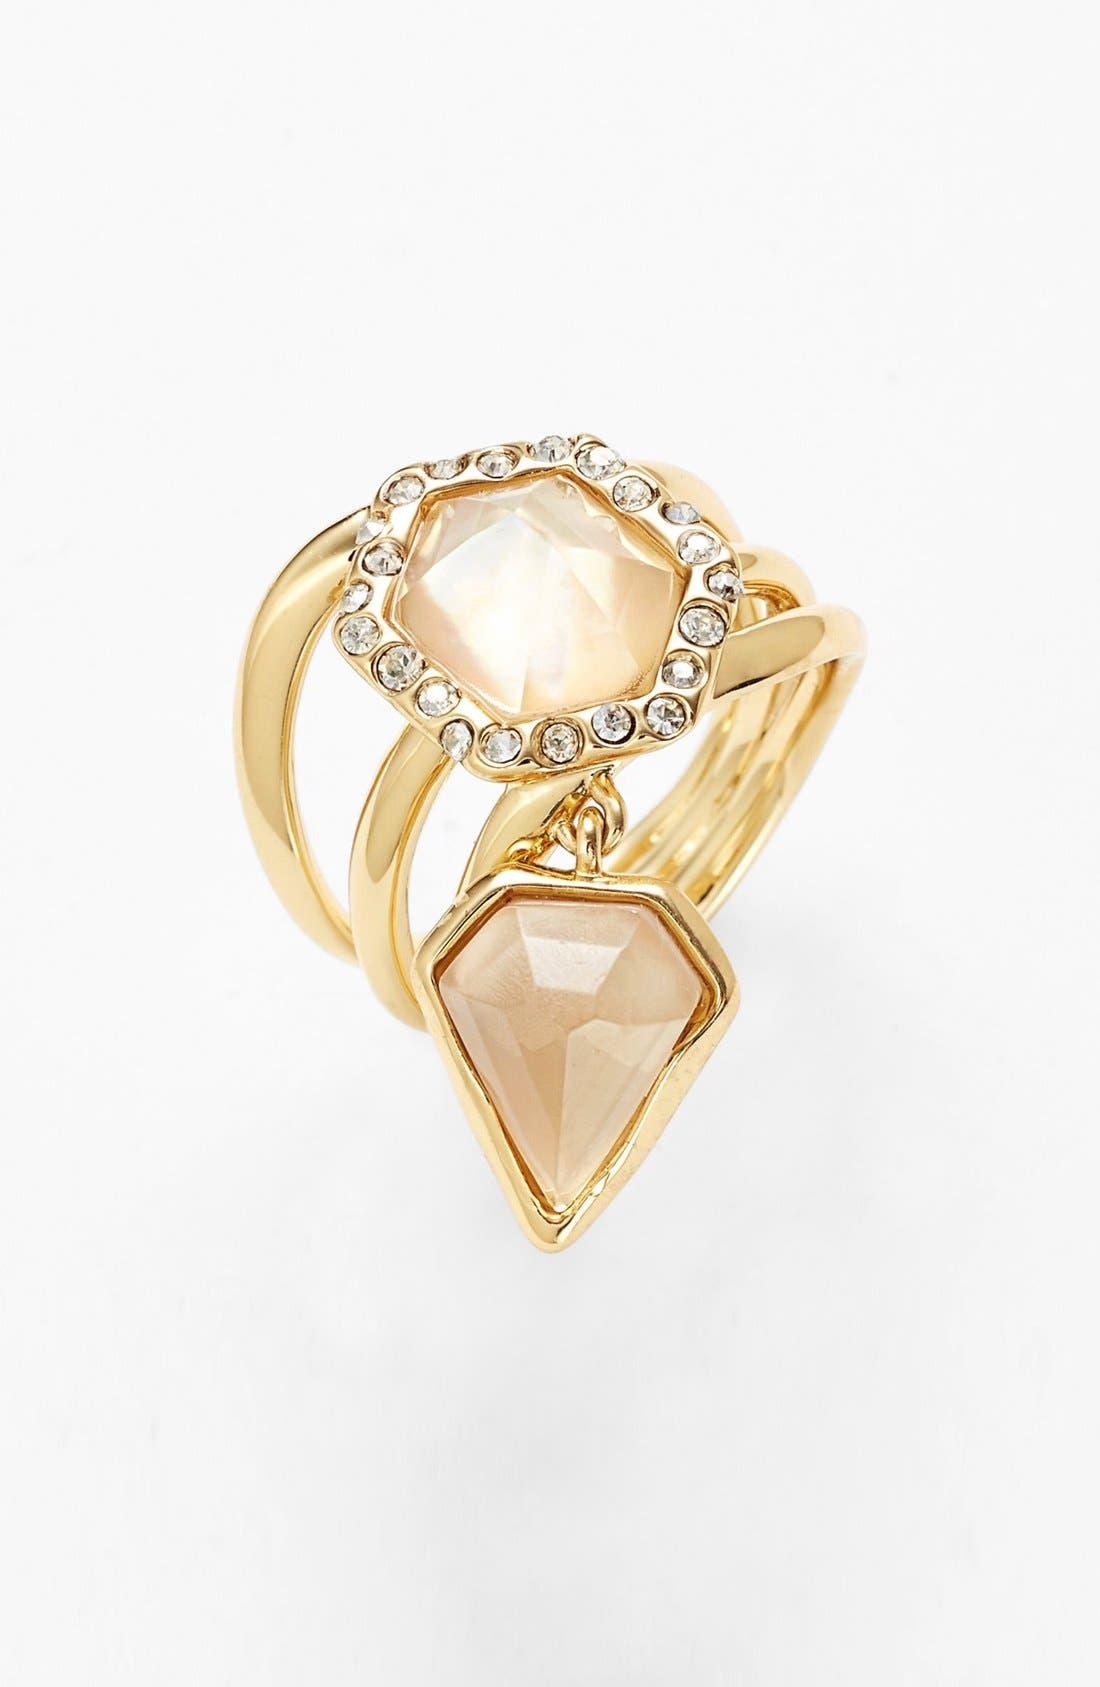 Alternate Image 1 Selected - Alexis Bittar 'Miss Havisham' Charm Stack Ring